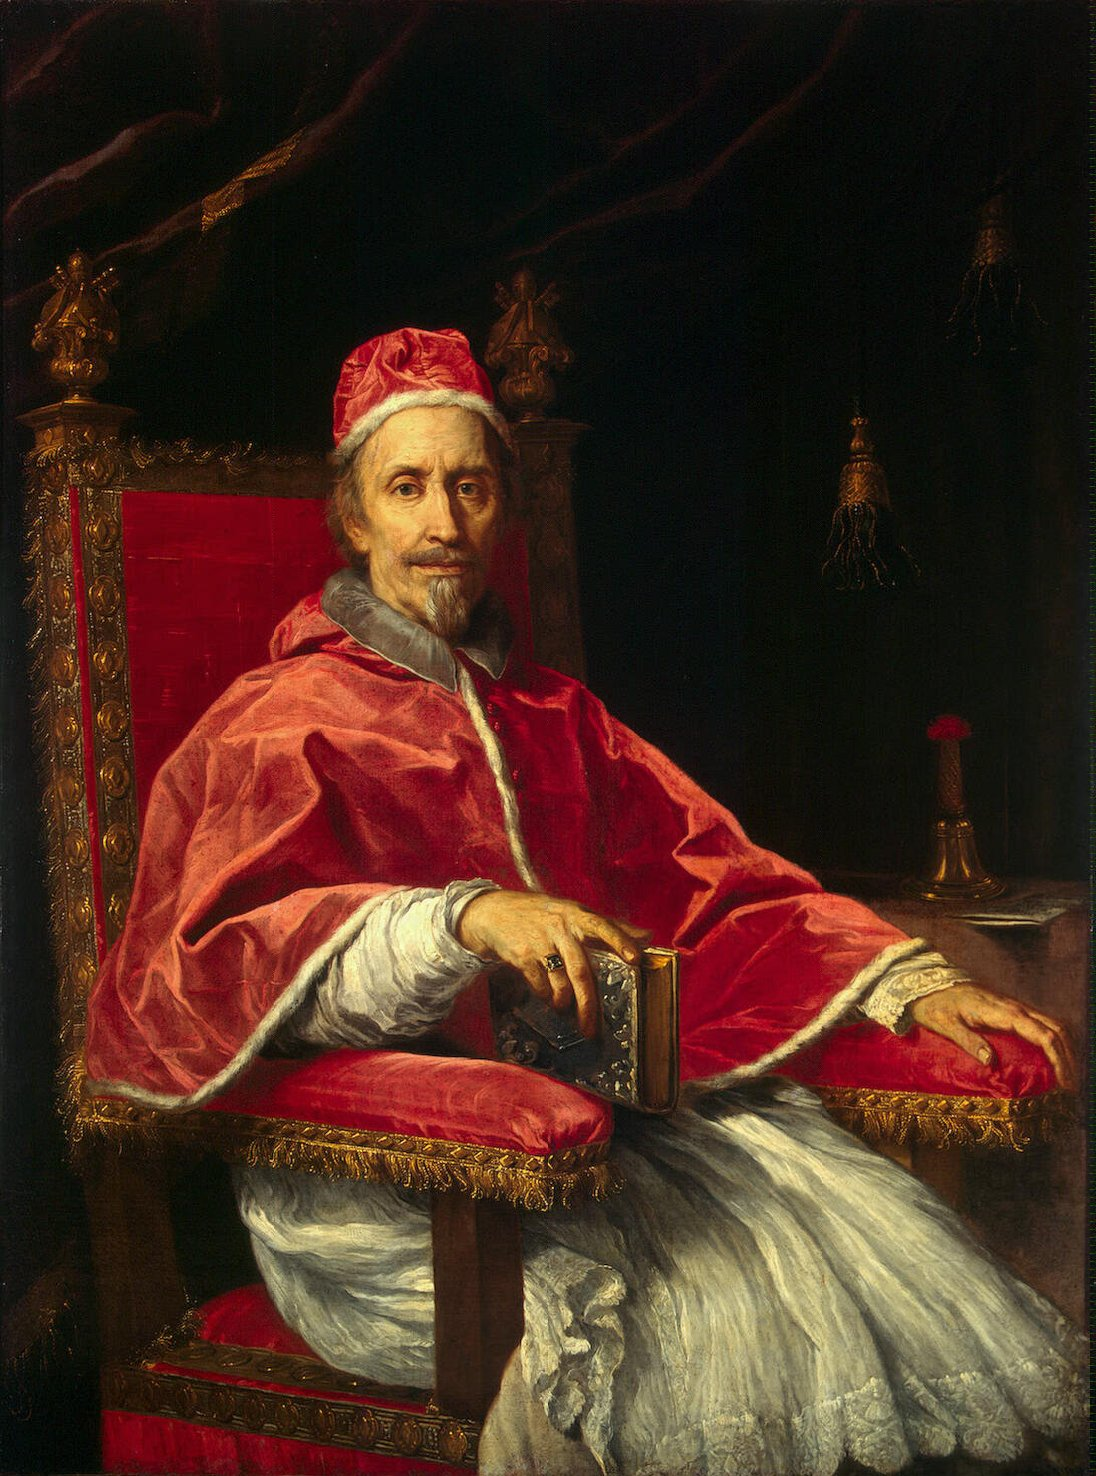 https://i1.wp.com/upload.wikimedia.org/wikipedia/commons/4/40/Pope_Clement_IX.jpg